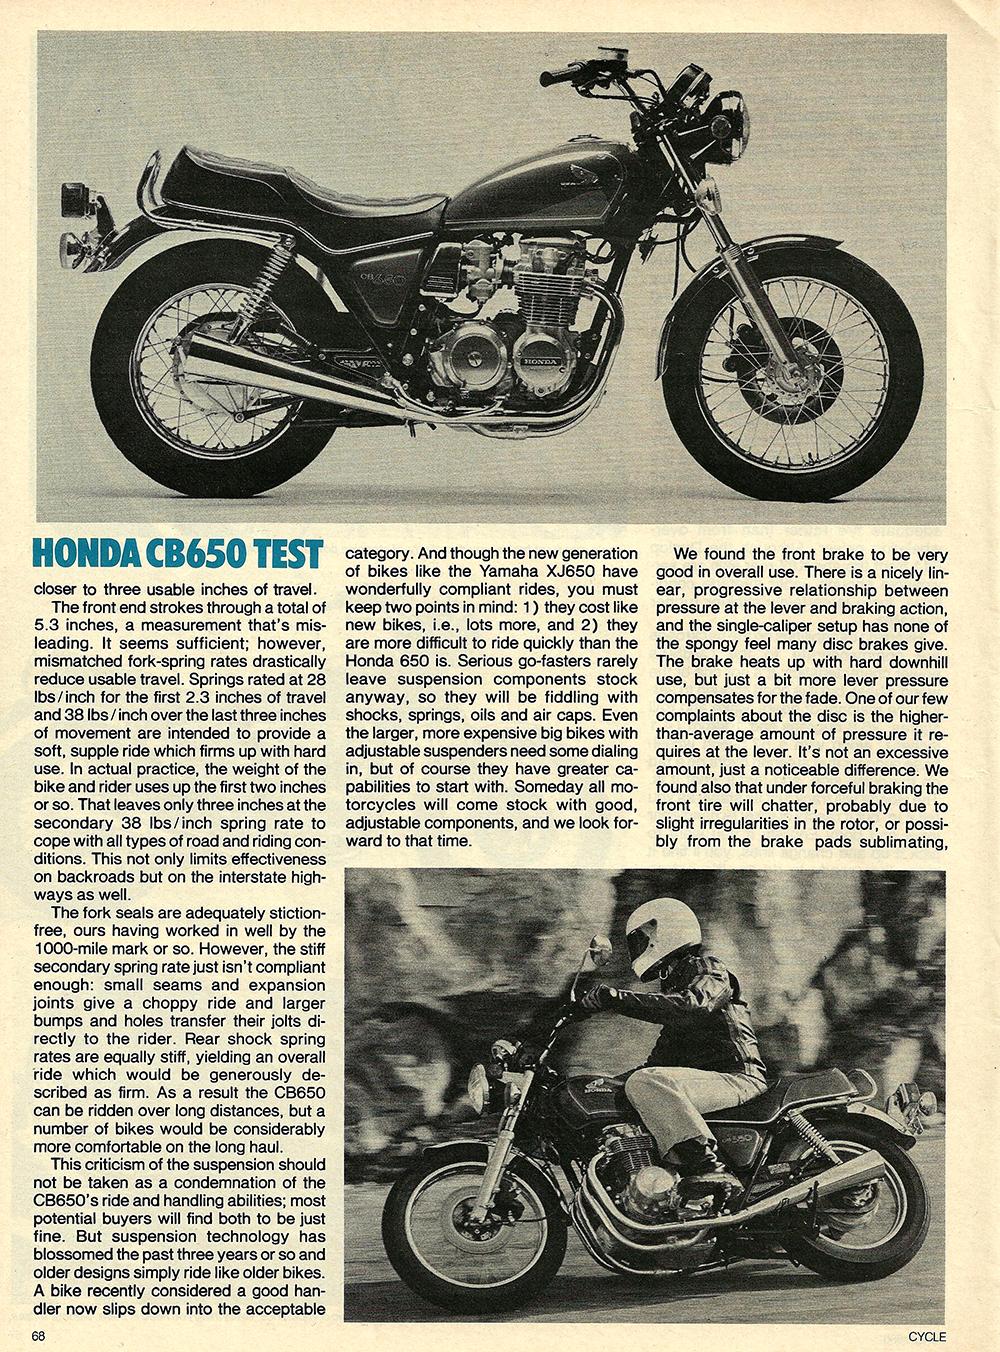 1980 Honda CB650 road test 05.jpg